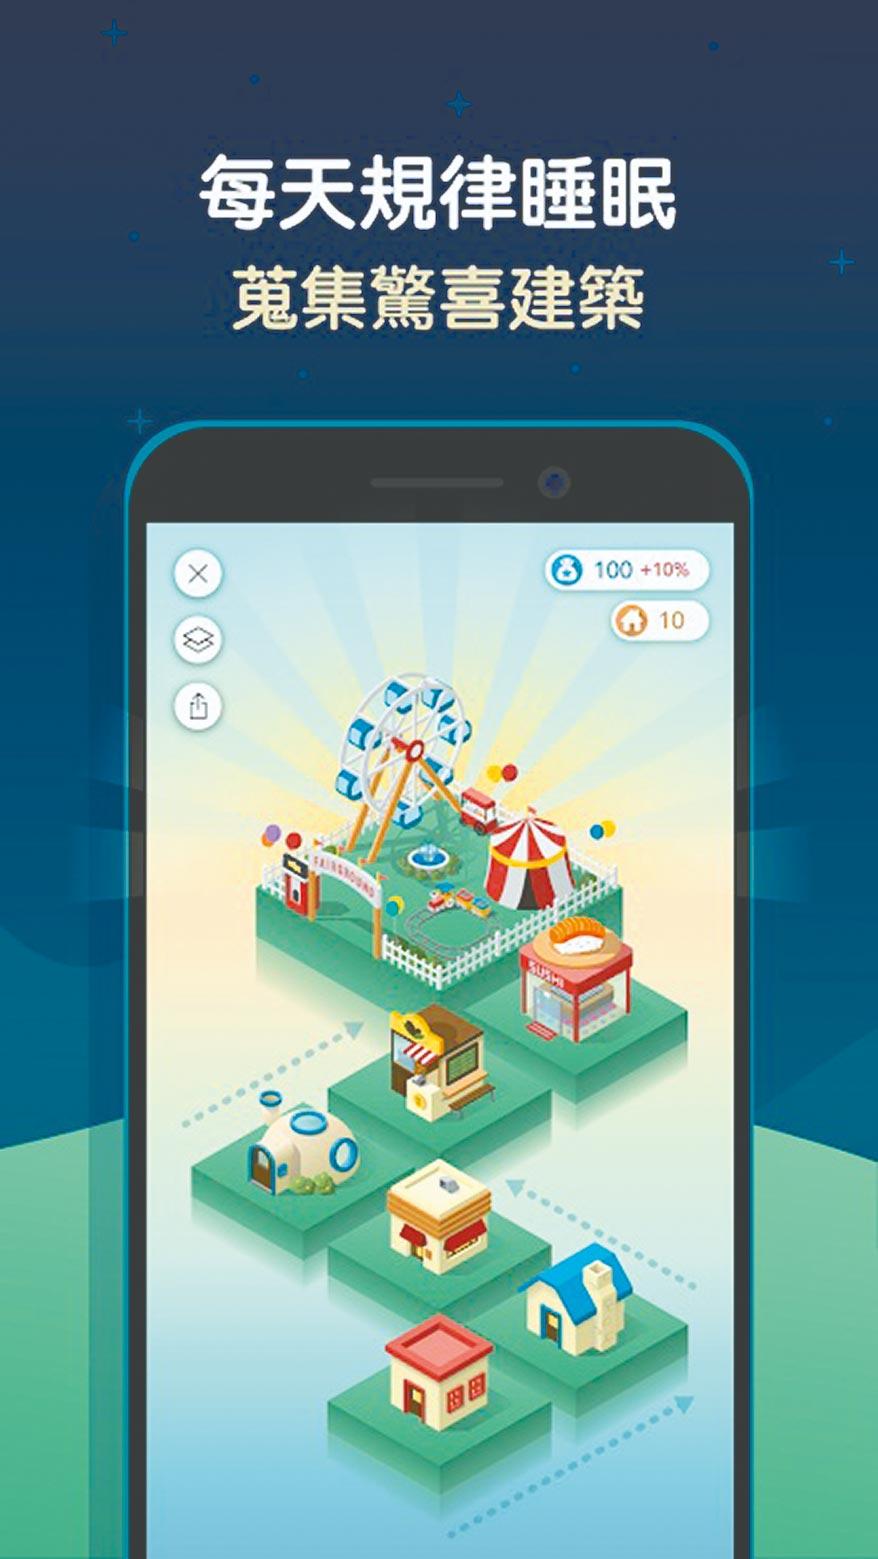 《SleepTown睡眠小鎮》以遊戲方式,協助使用者每日去達成睡覺及起床目標。(Google官網)